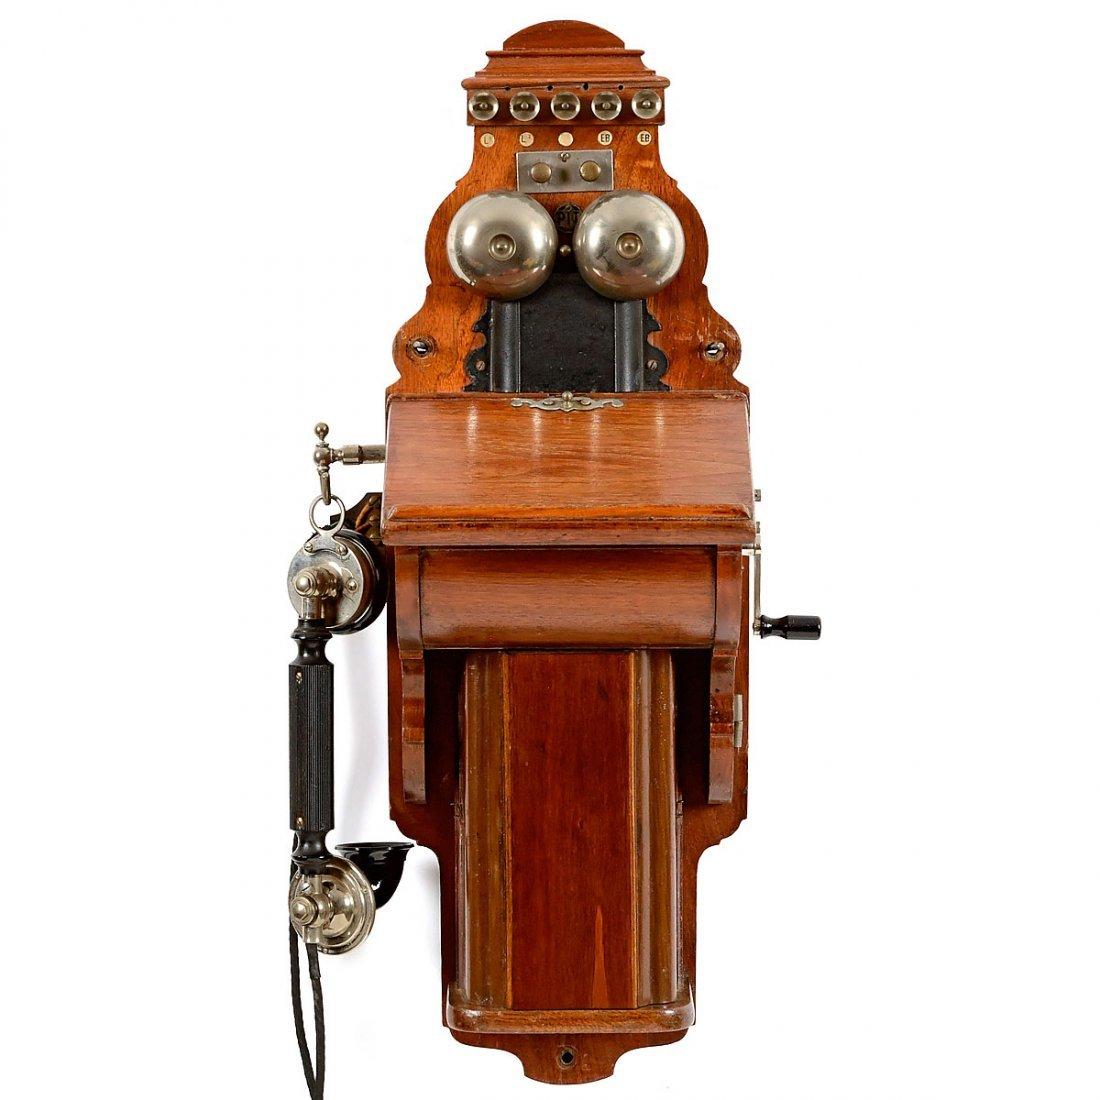 L.M. Ericsson Type B Wall Telephone, 1921